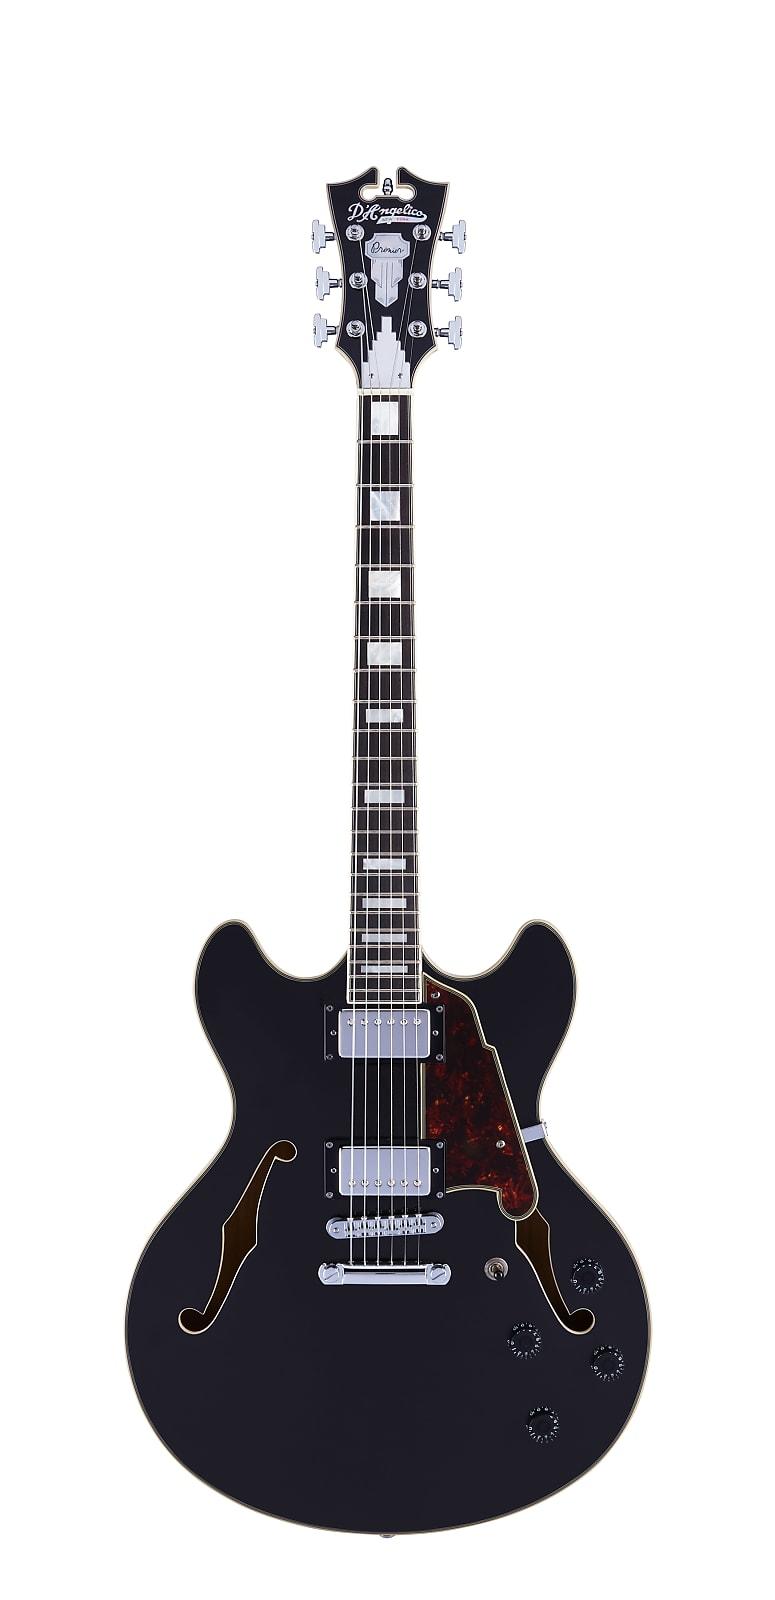 D'Angelico Premier DC Semi-Hollow Electric Guitar Black Flake w/ Gig Bag